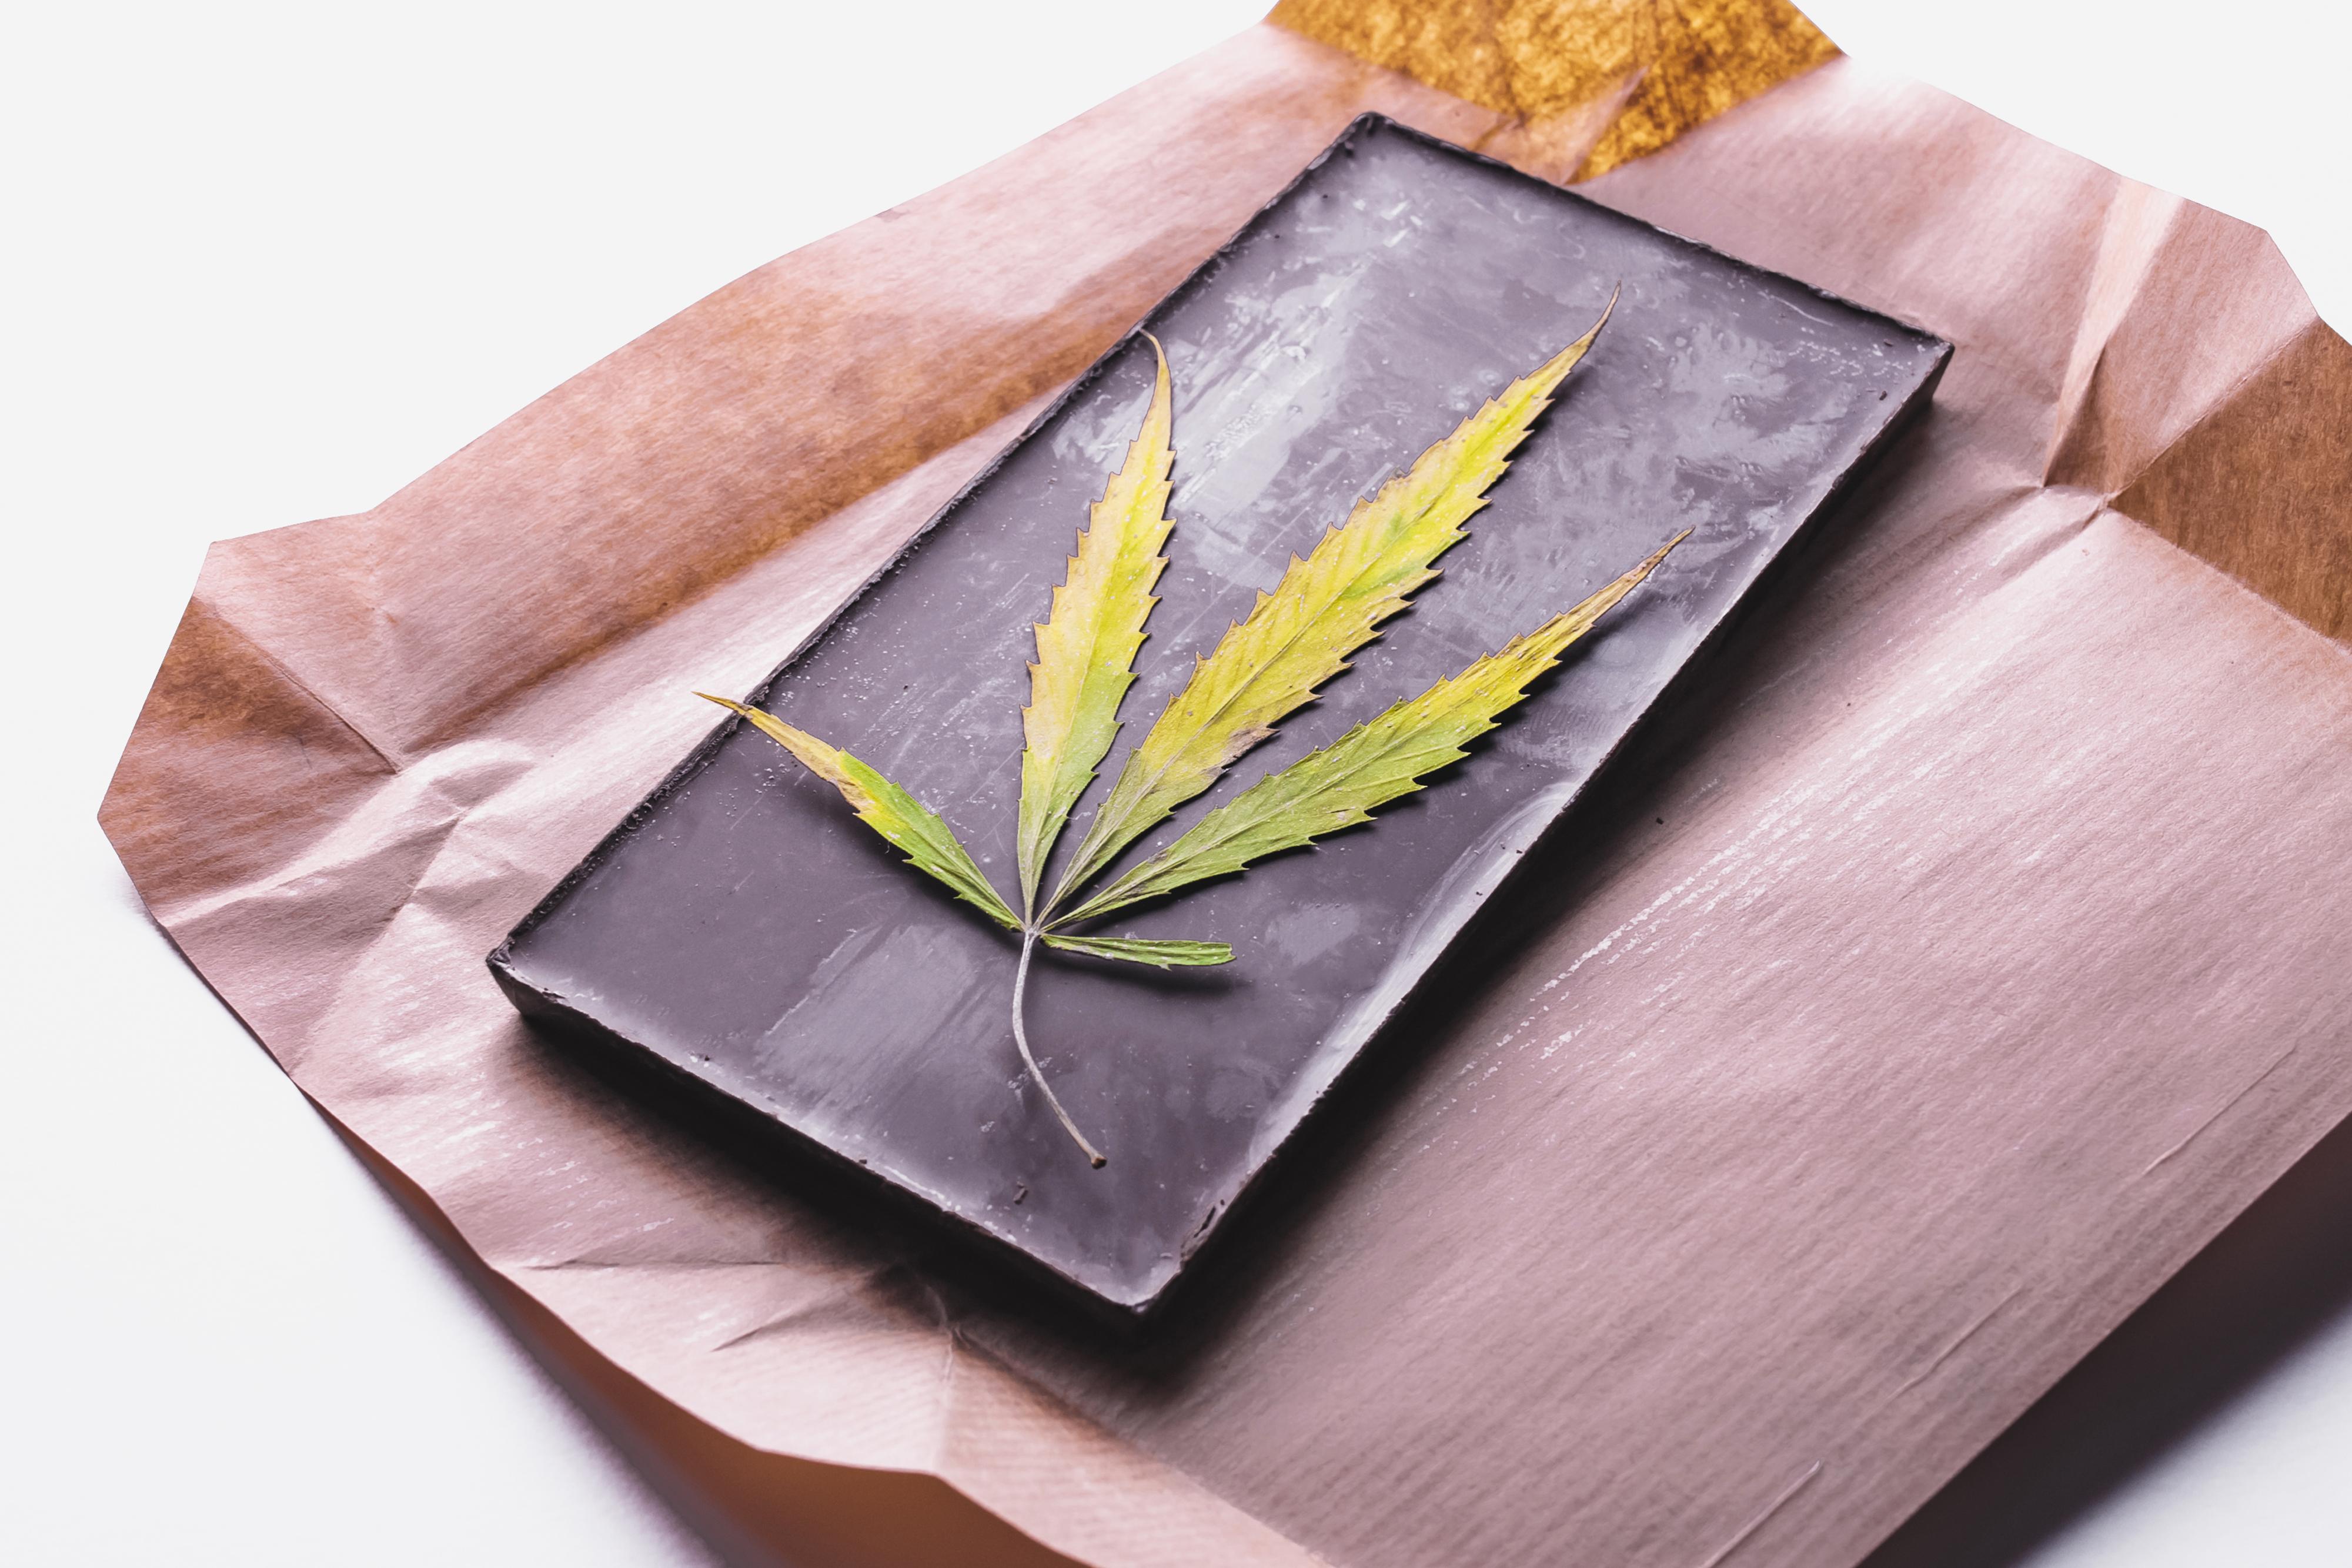 Cannabis is medicine — don't make it taste good - Harvard